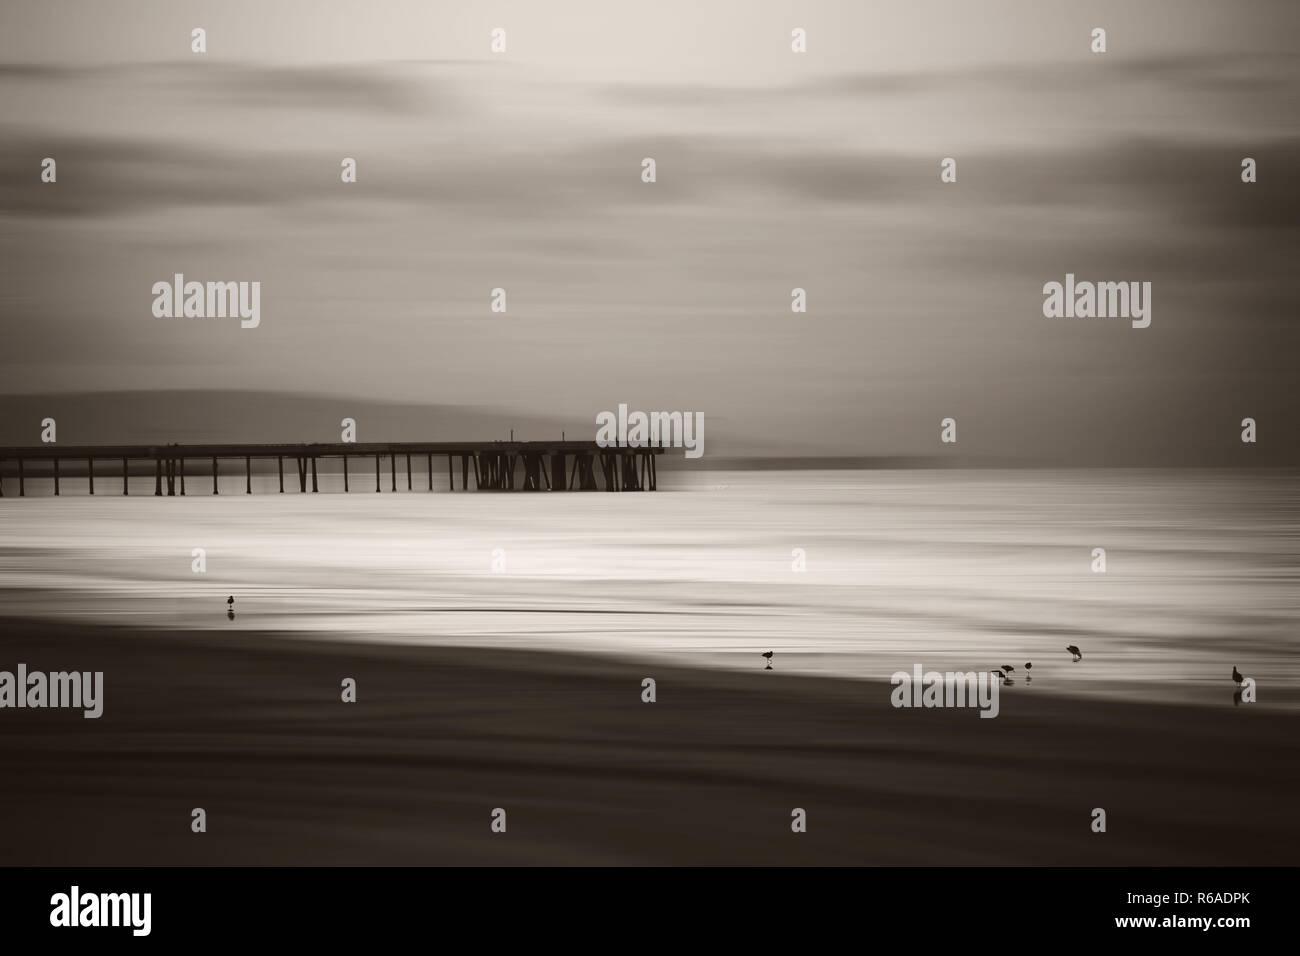 Wiped Ocean With Boardwalk - Stock Image